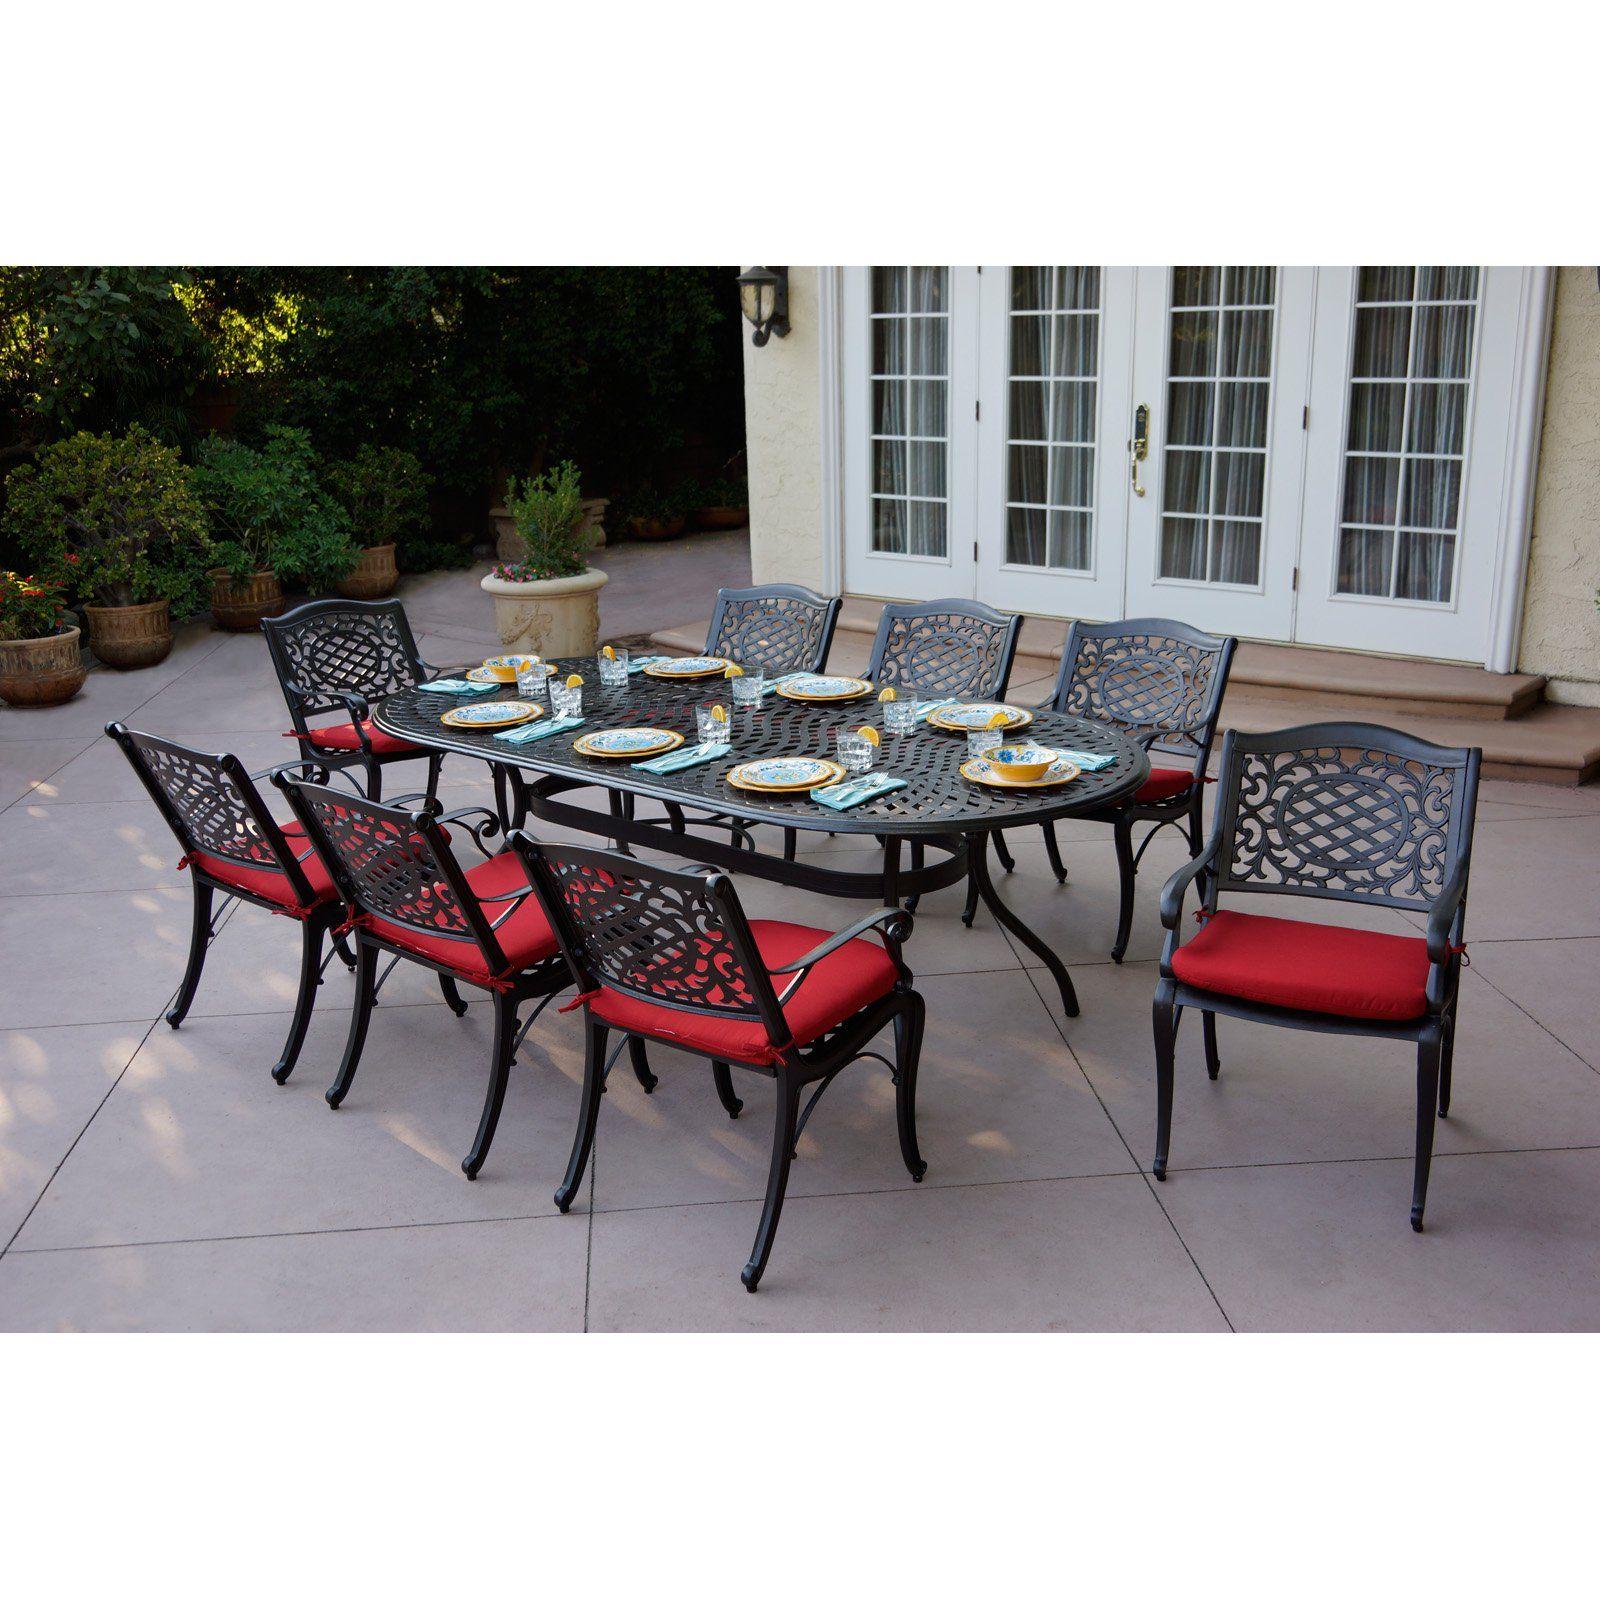 Ac Home Pasadena Cast Aluminum 9 Piece Outdoor Patio Dining Set